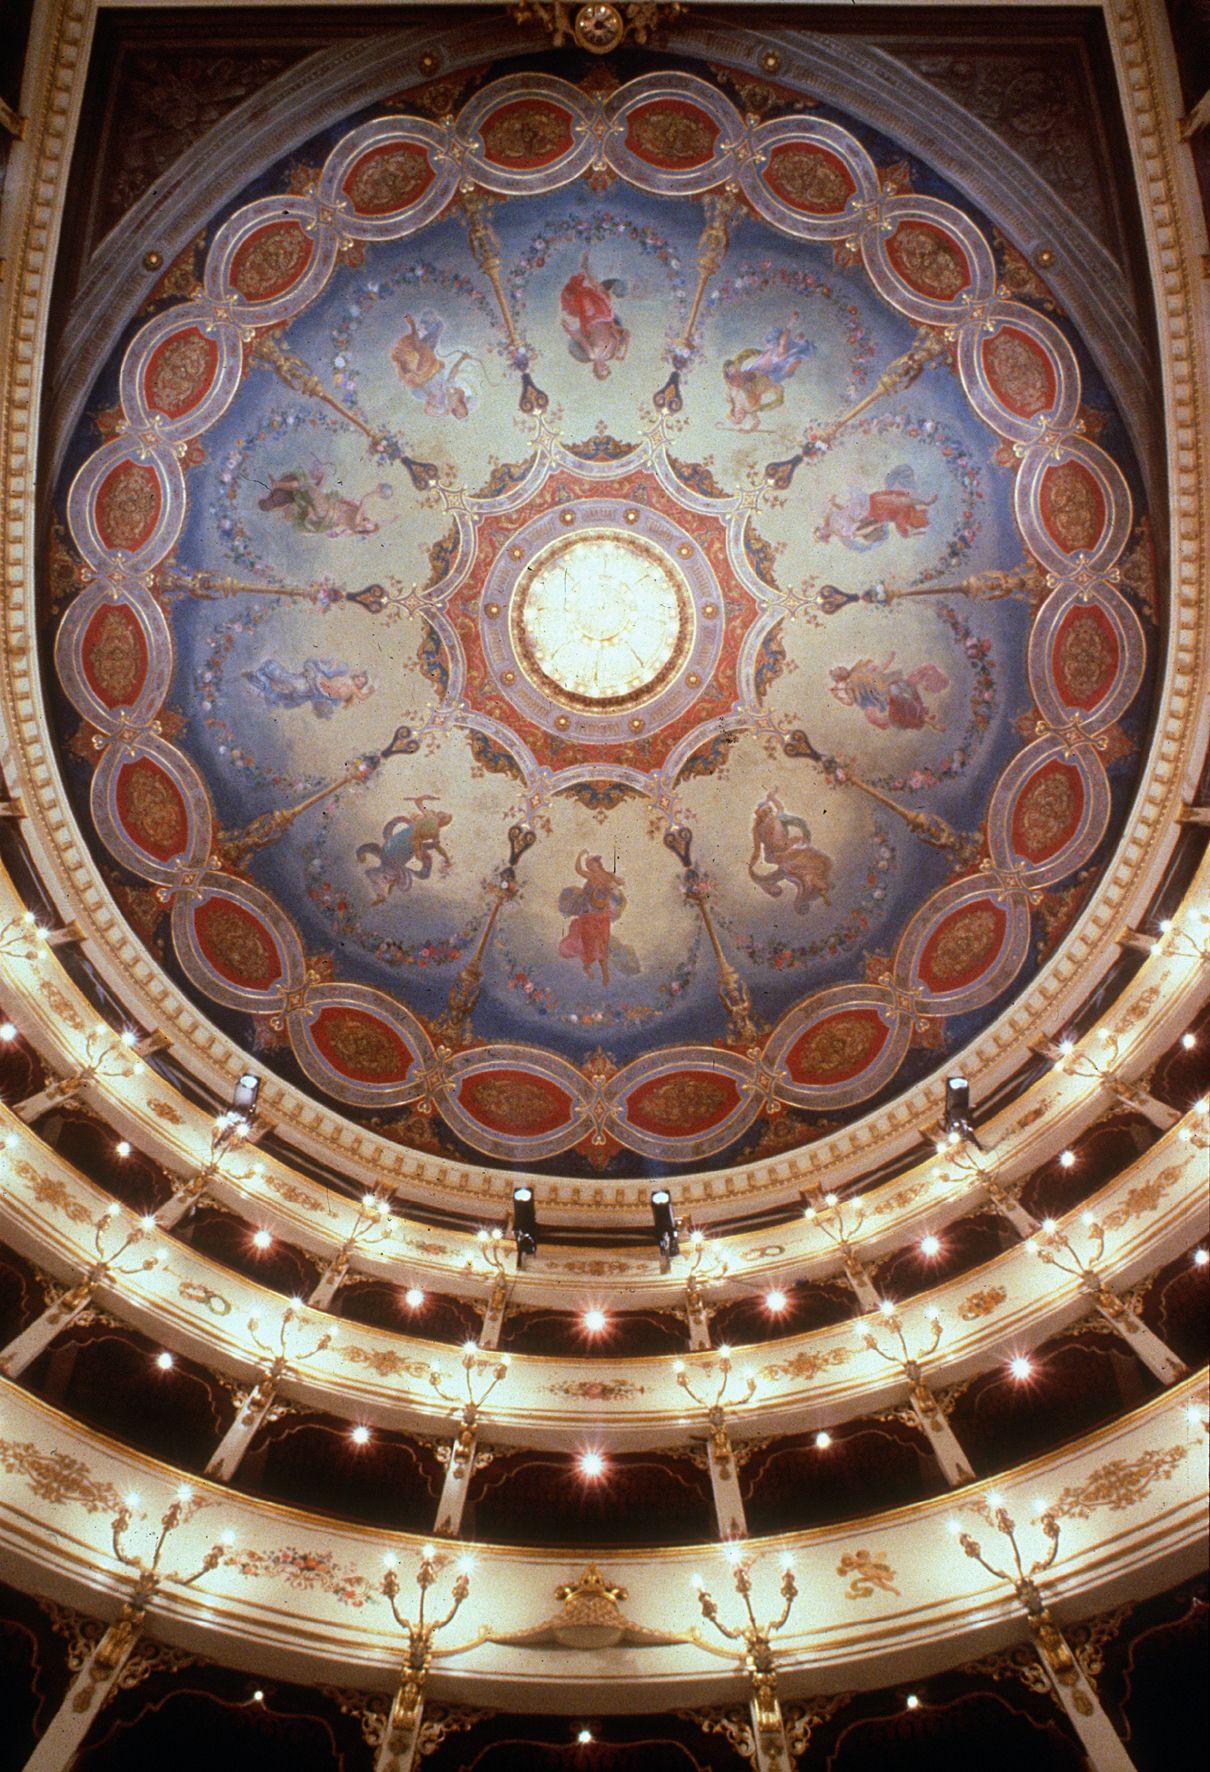 teatro rossini pesaro (With images) | Pesaro, Opera house ...